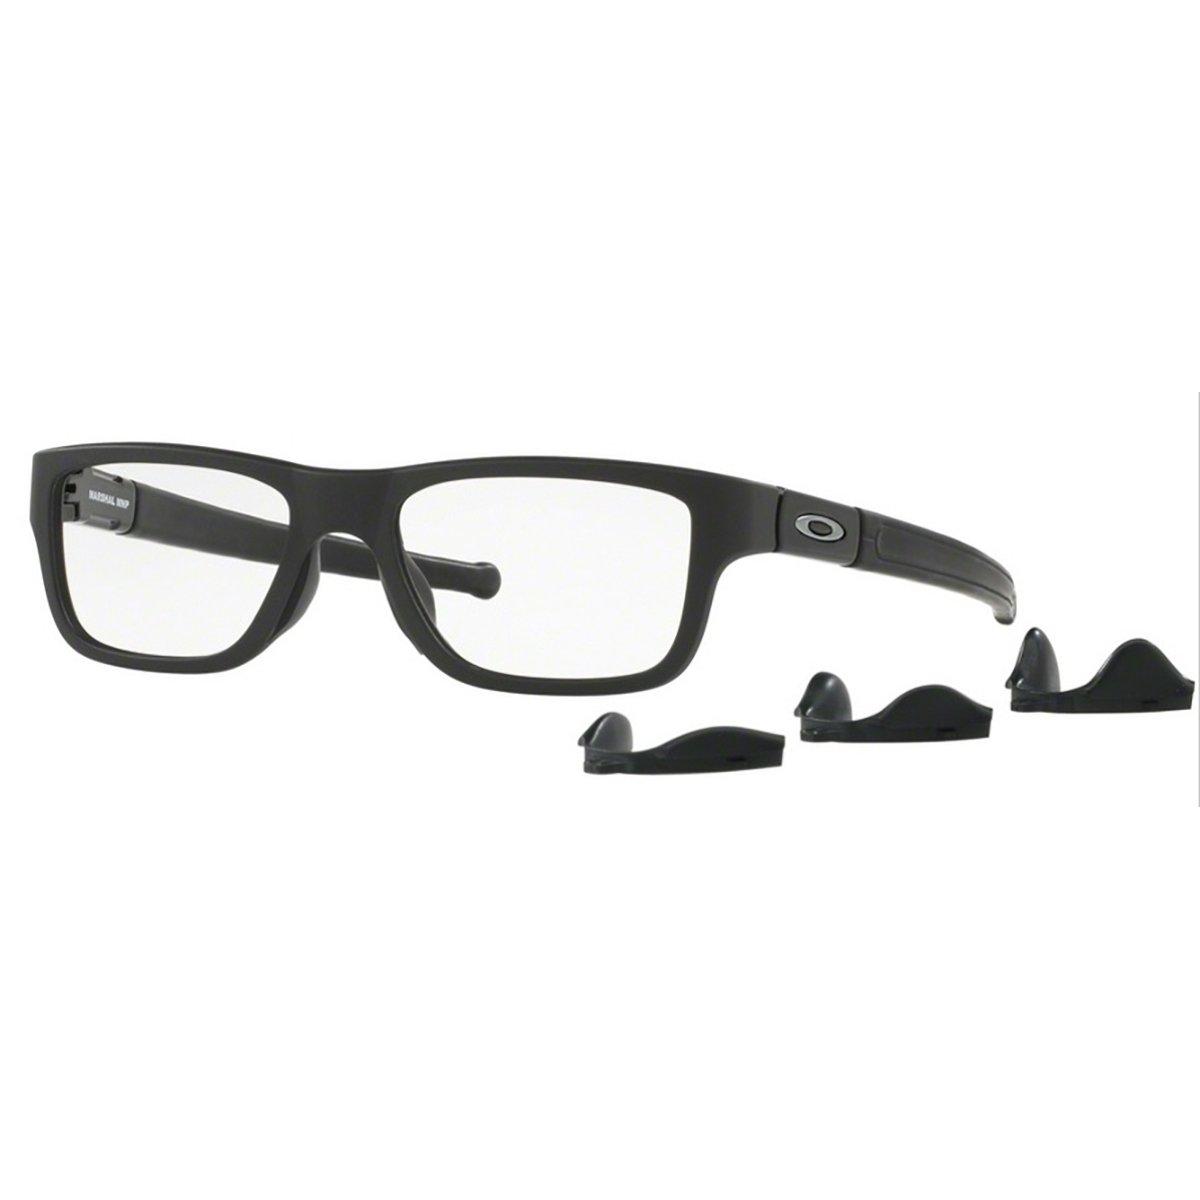 Compre Óculos de Grau Oakley Marshal MNP em 10X   Tri-Jóia Shop 0af37d156f